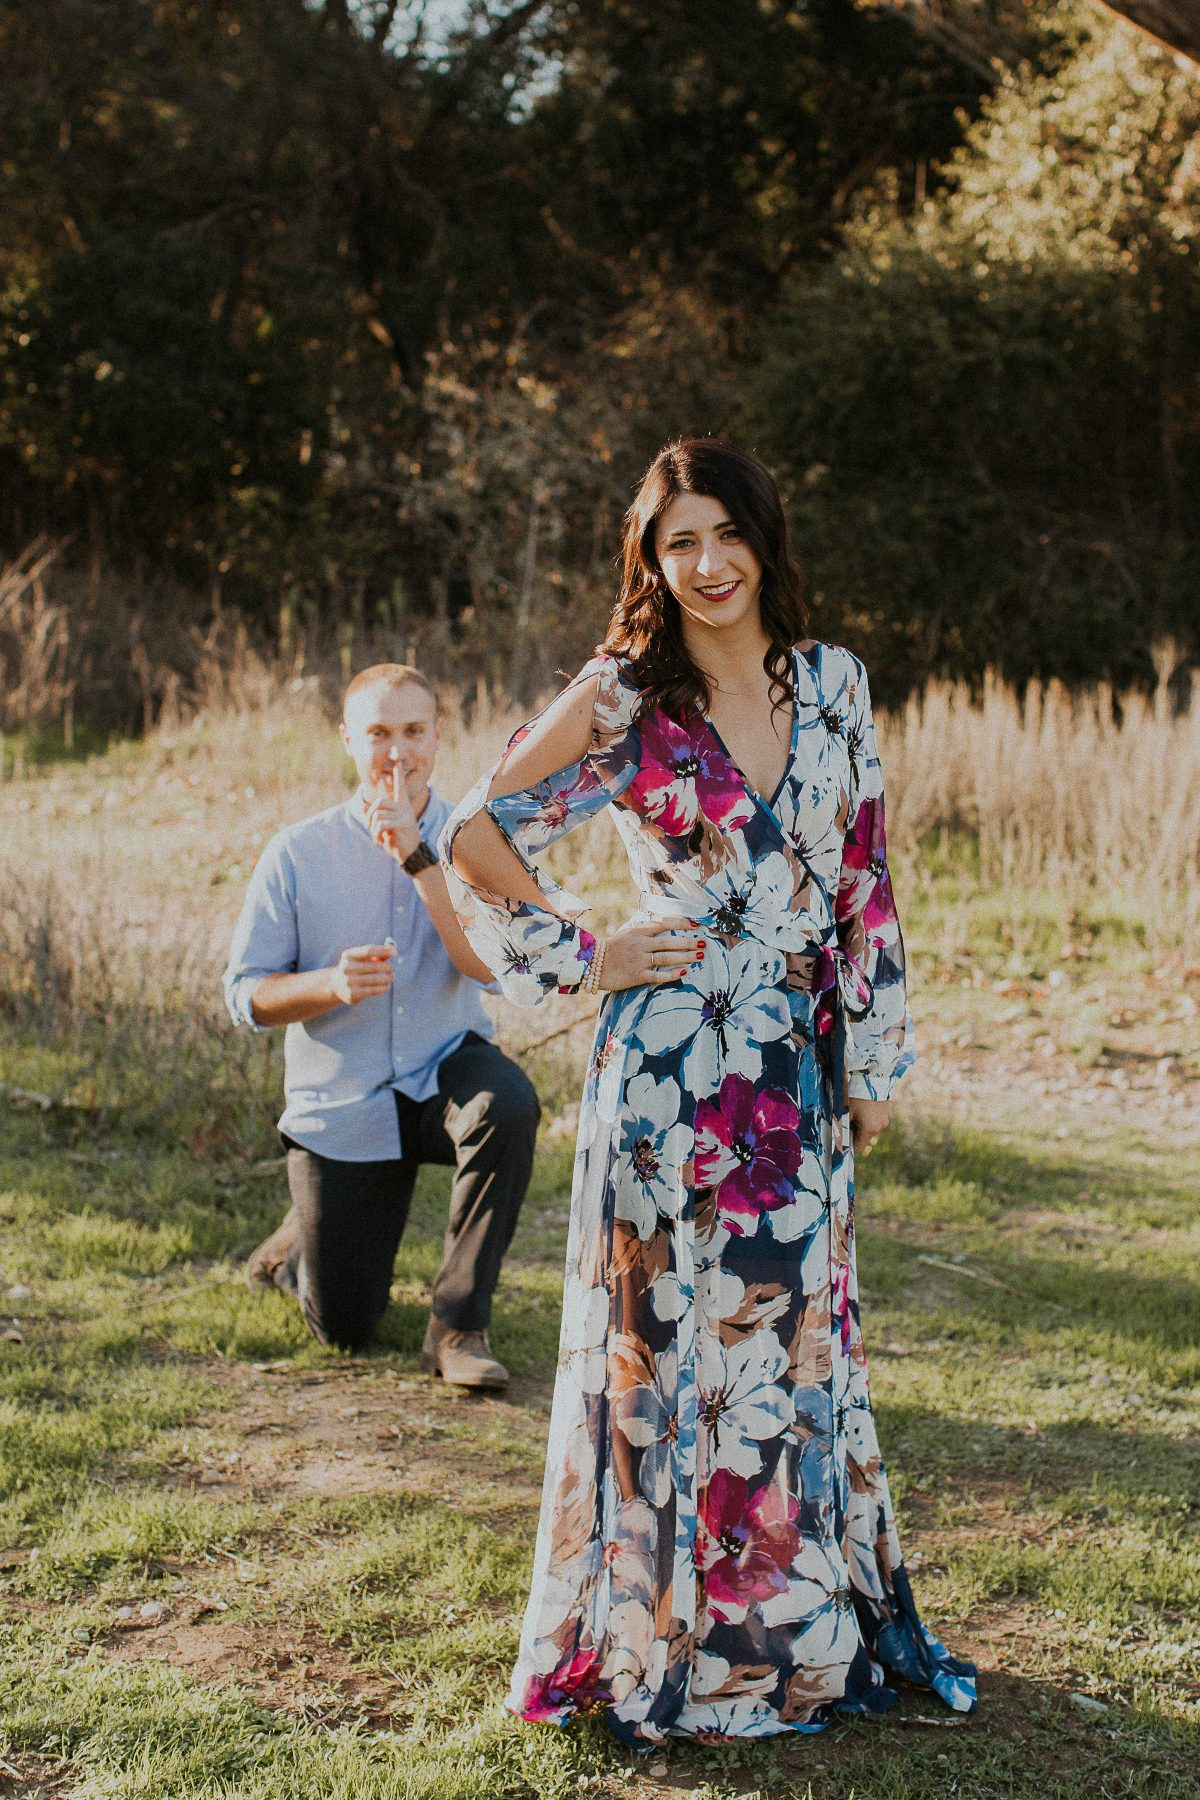 Marriage Proposal Ideas in San Diego, CA